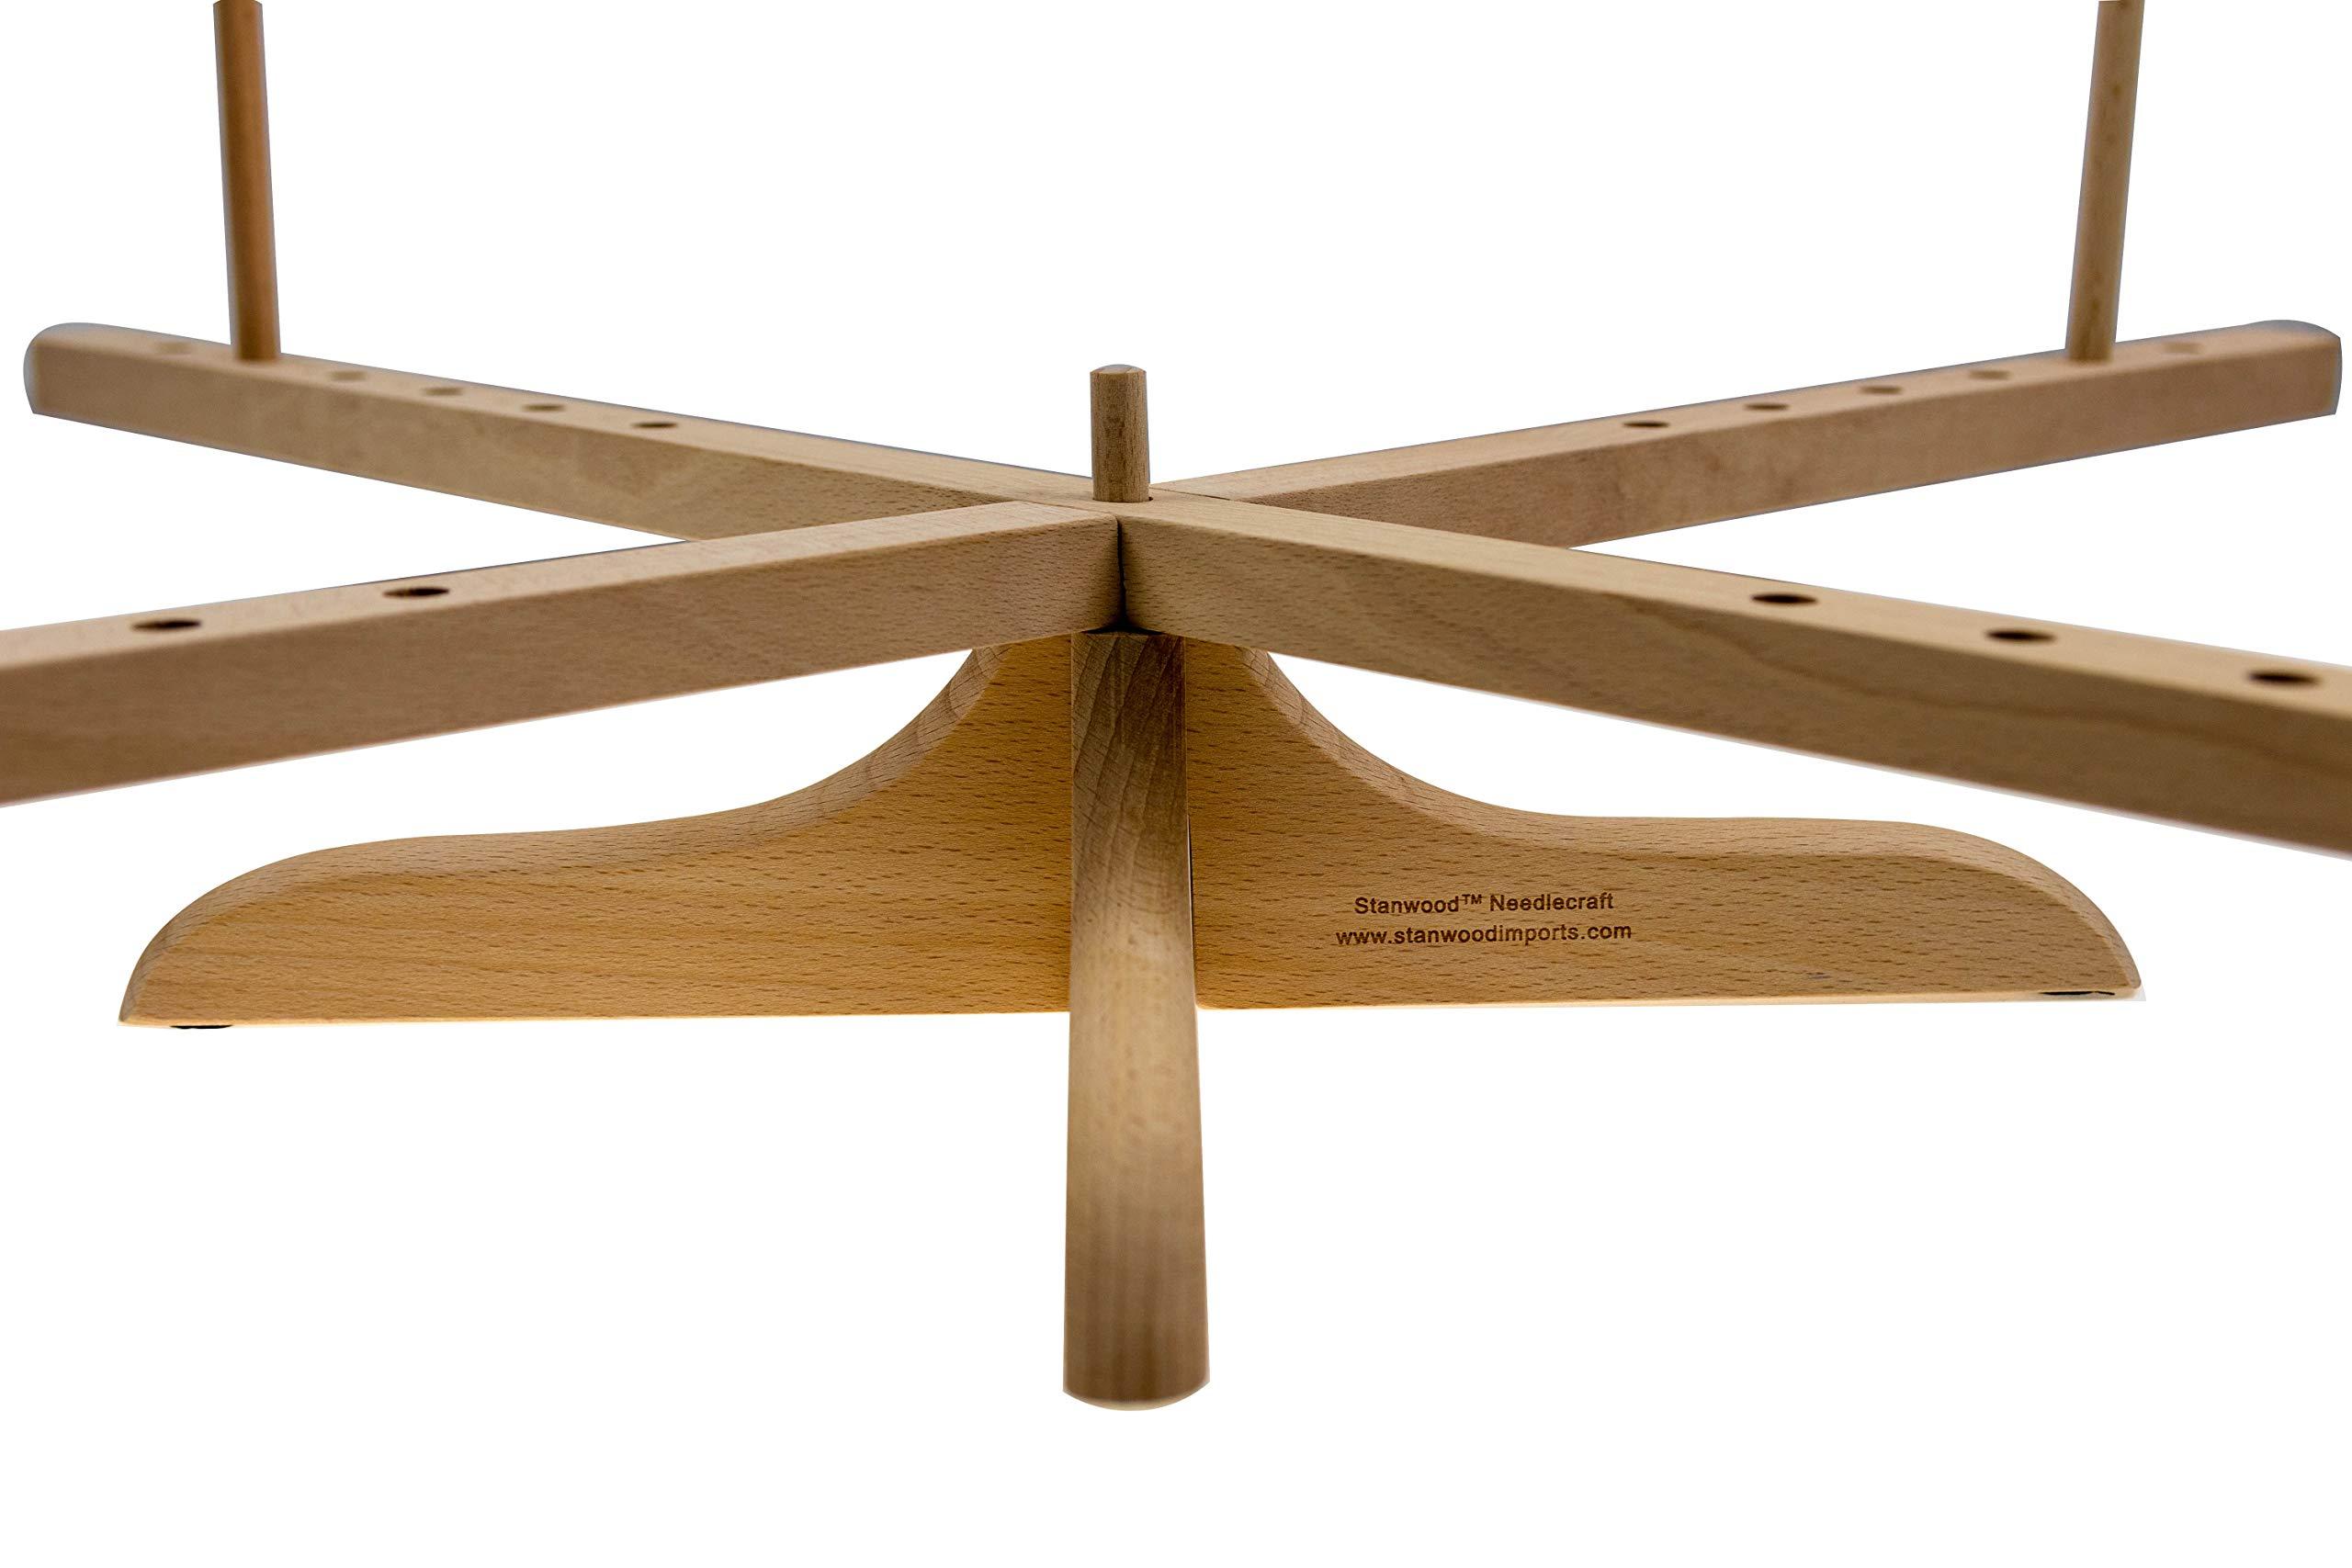 Stanwood Needlecraft Tabletop Amish Style Wooden Yarn Swift, 2.5-6-Feet (YW-3) by Stanwood Needlecraft (Image #4)